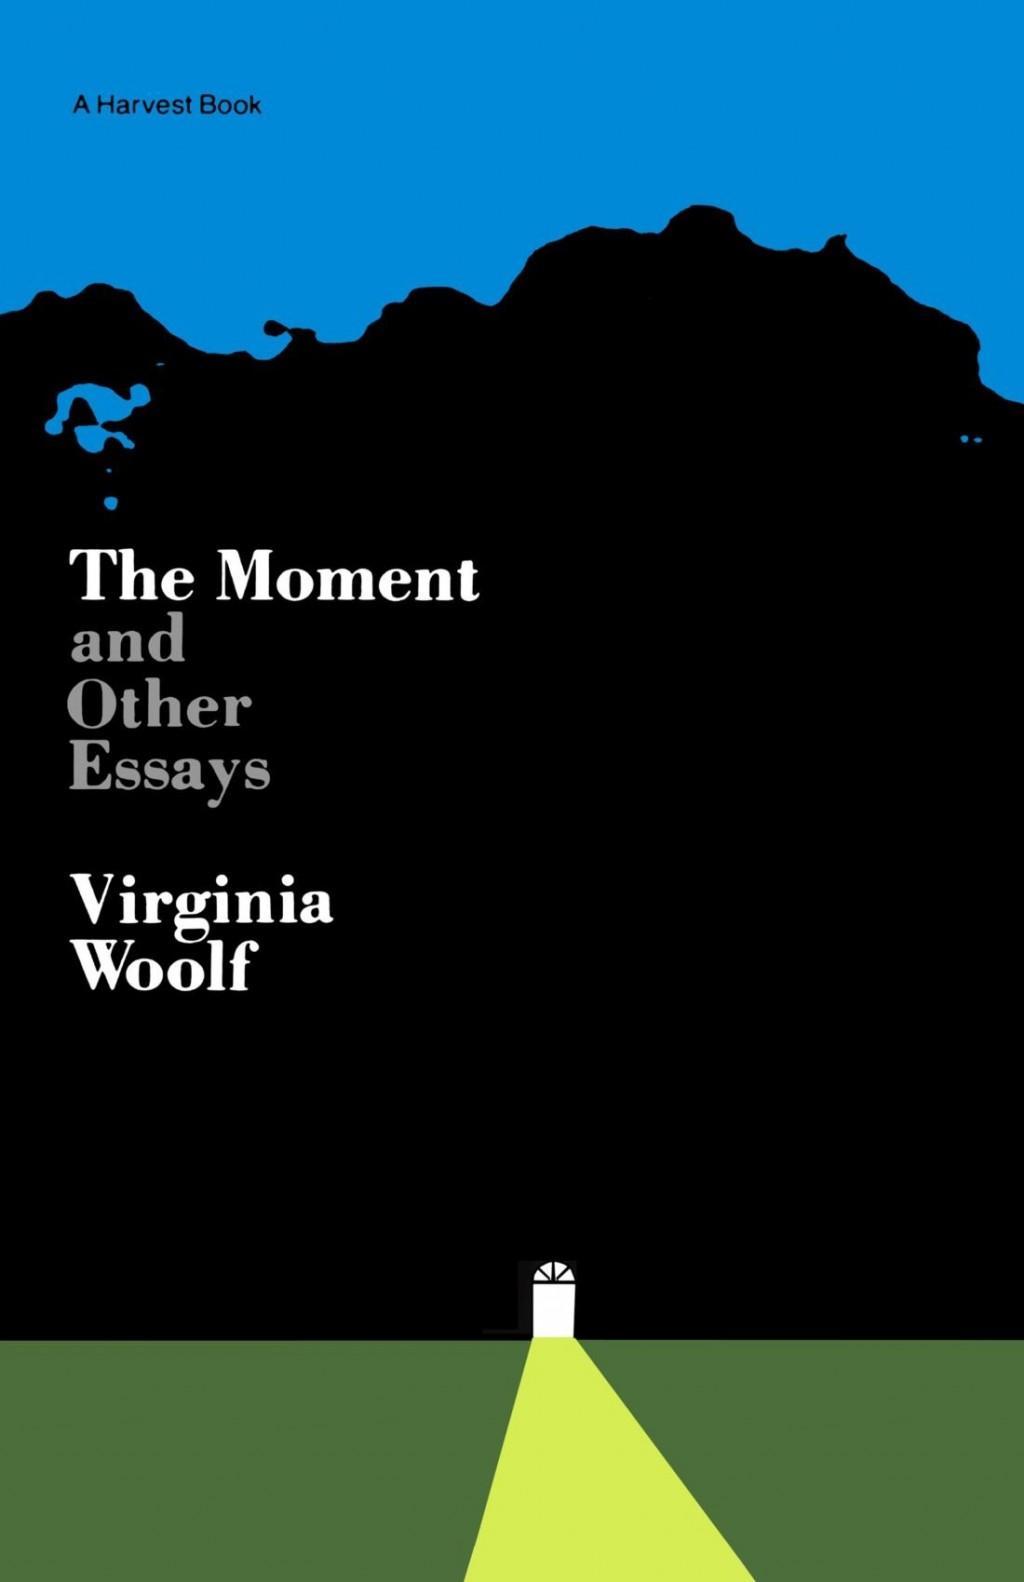 011 Virginia Woolf Essays Gs8rmzl Essay Unusual Online The Modern Analysis On Self Large